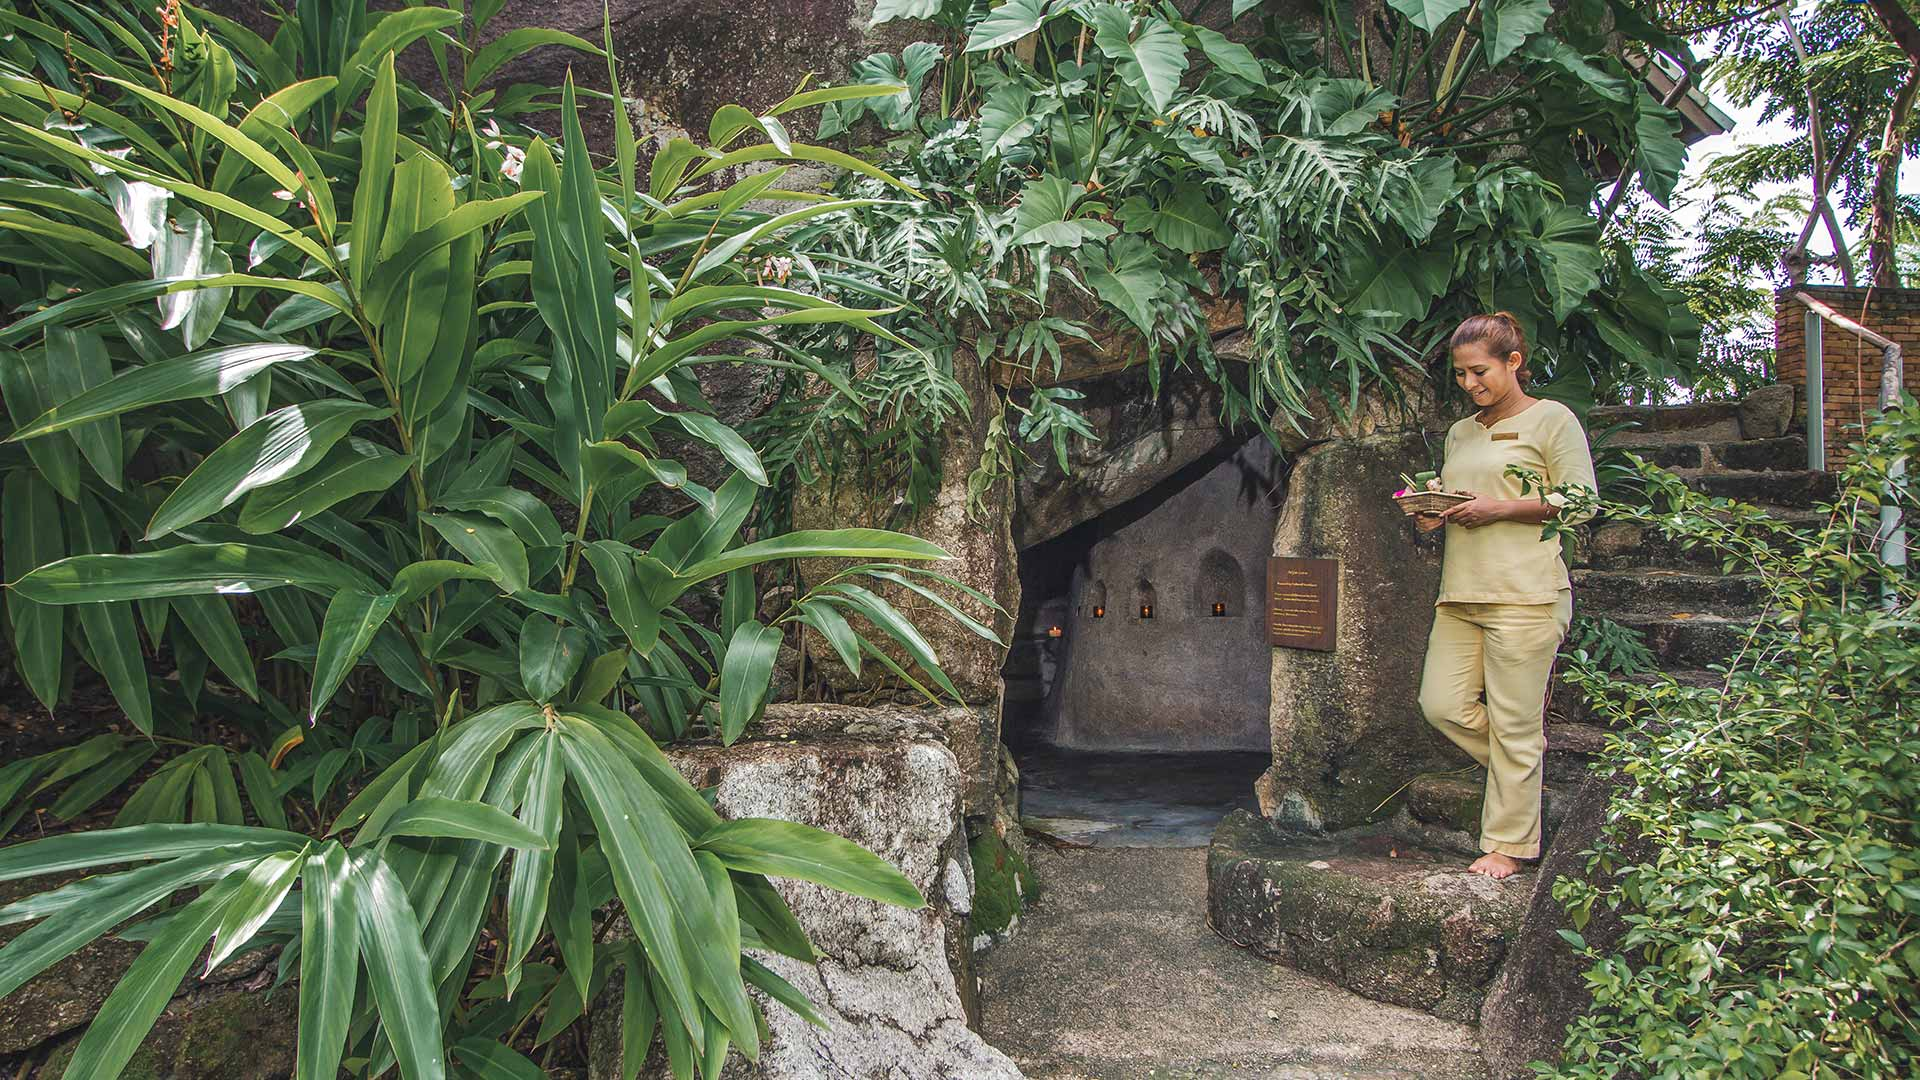 Monk Cave at Kamalaya Koh Samui